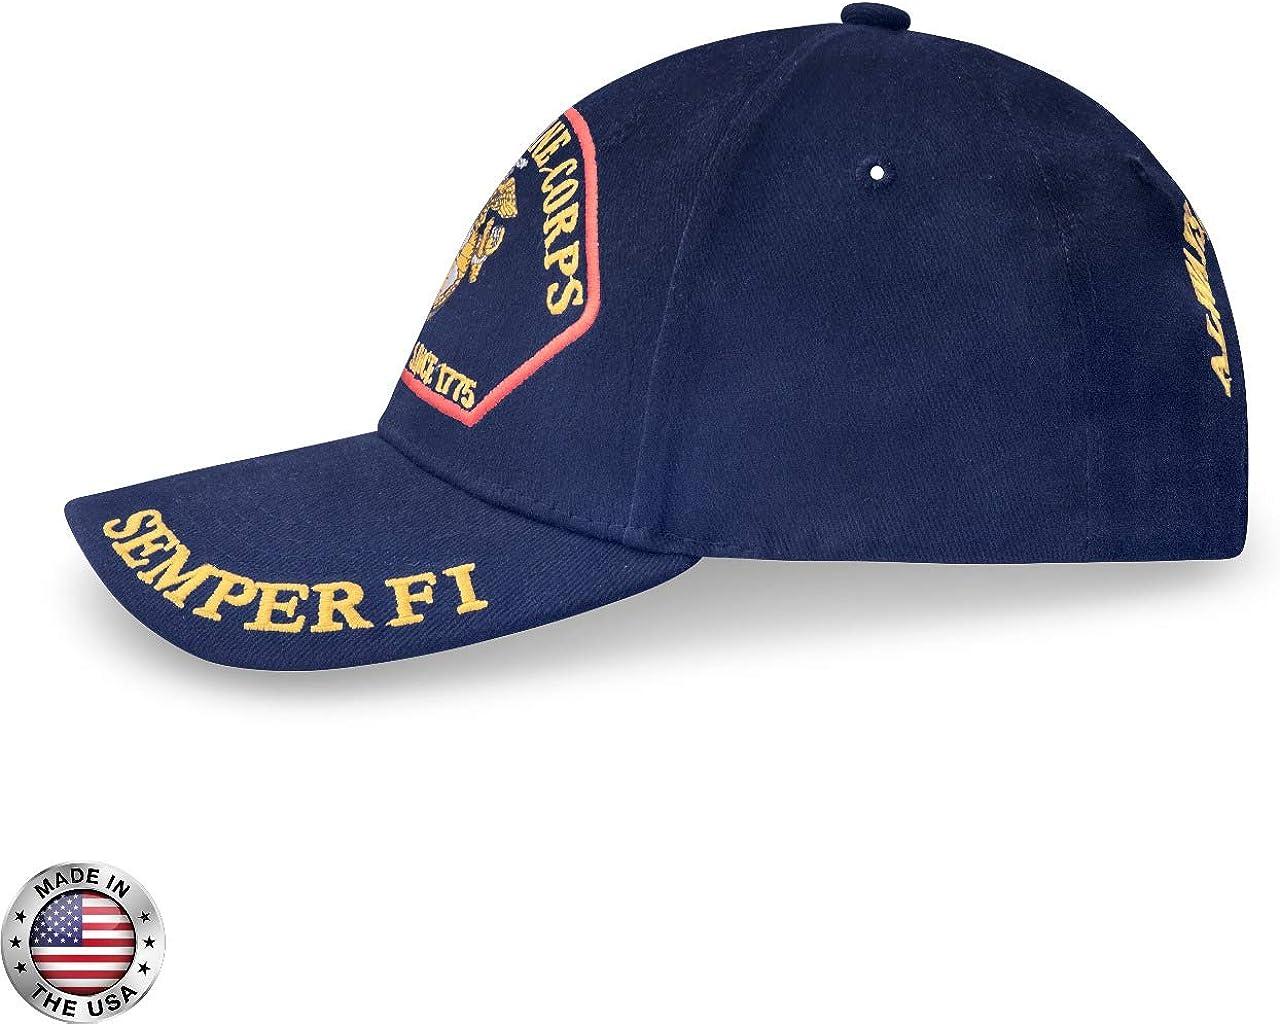 Marines Baseball Cap M/änner Usa Army Cap Military Black Cap Hut F/ür Im Freien Verstellbare Navy Seal Baseball Cap